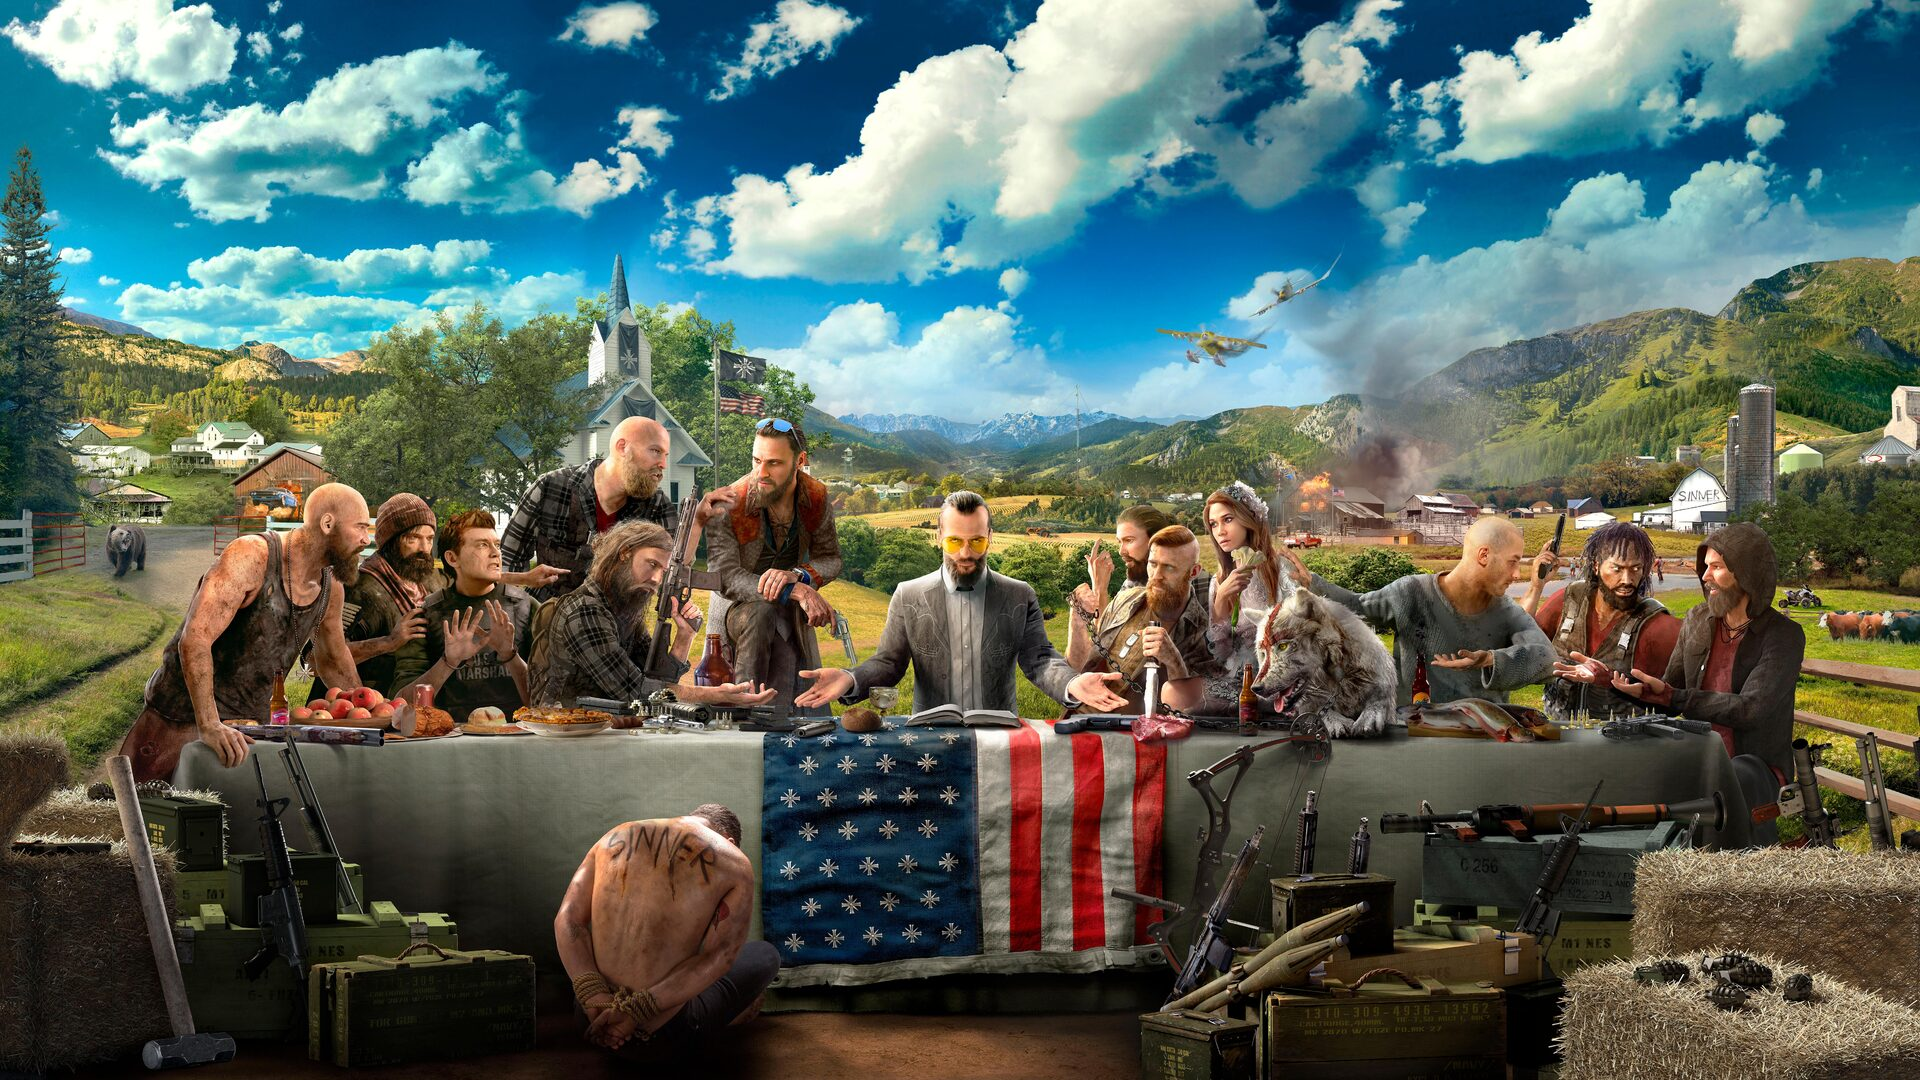 Far Cry 5 Wallpaper 4k: 1920x1080 Far Cry 5 8k Laptop Full HD 1080P HD 4k